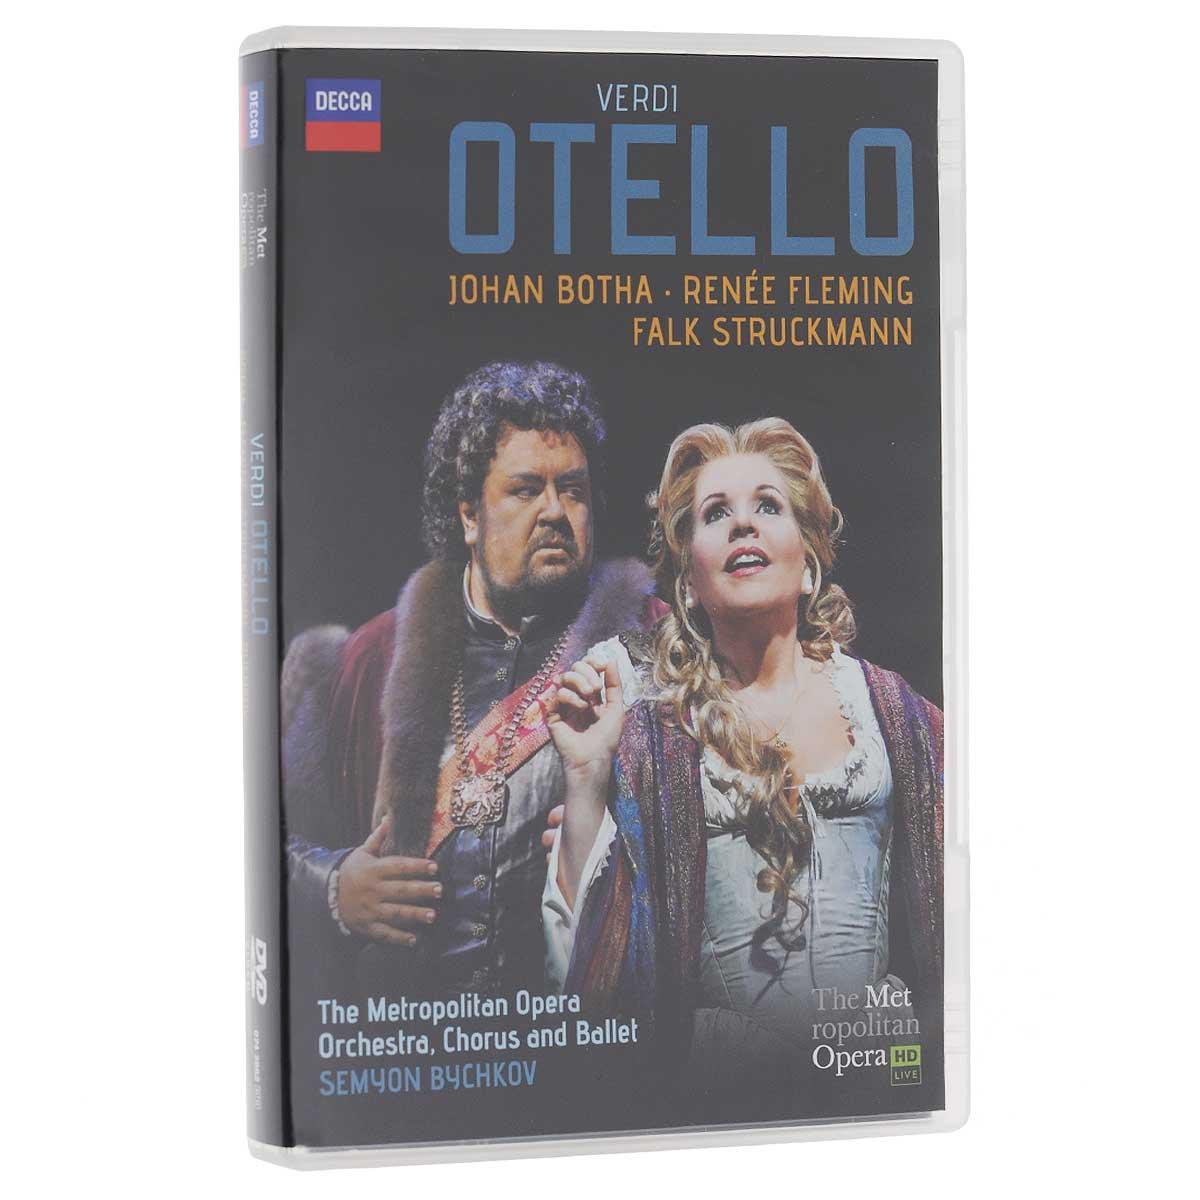 piena pi017ewhim36 Semyon Bychkov. Giuseppe Verdi. Otello